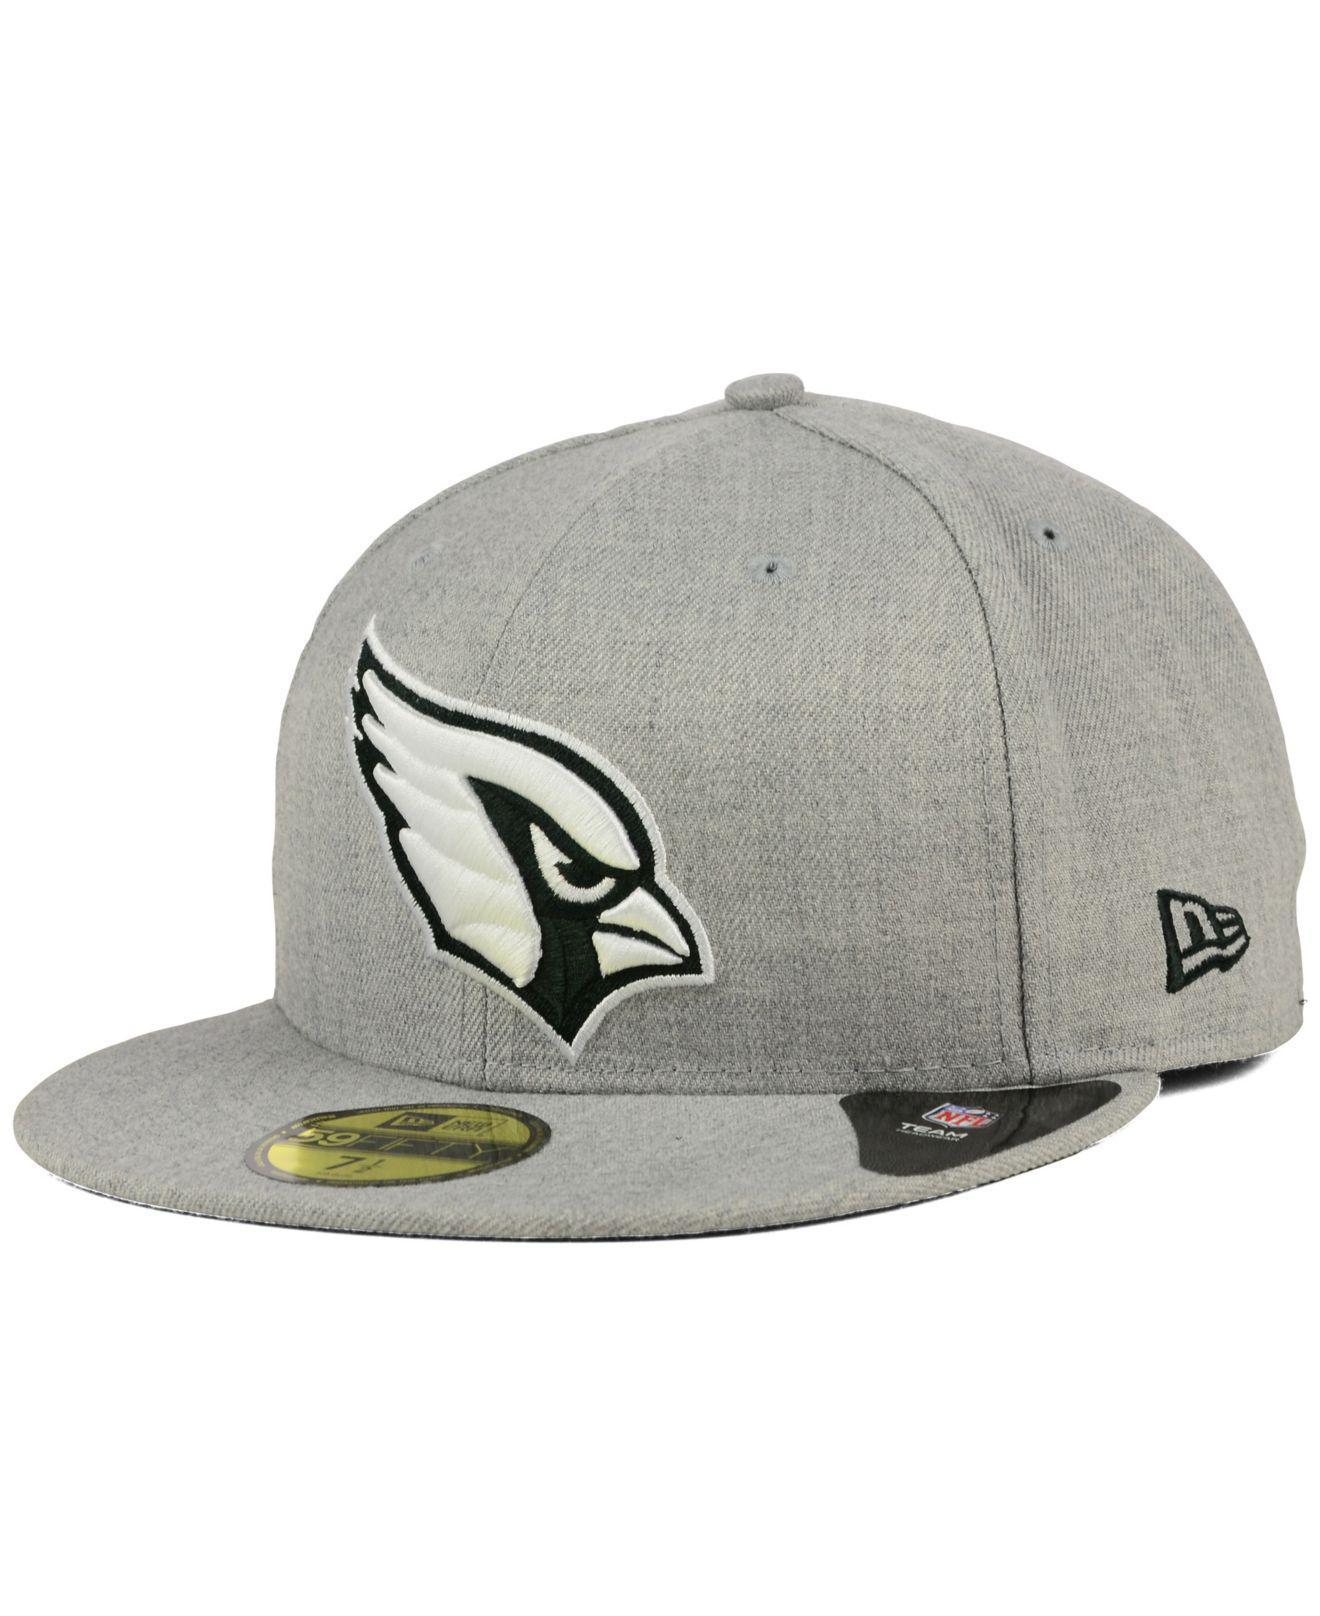 9f9032fa1 Lyst - KTZ Arizona Cardinals Heather Black White 59fifty Cap in Gray ...